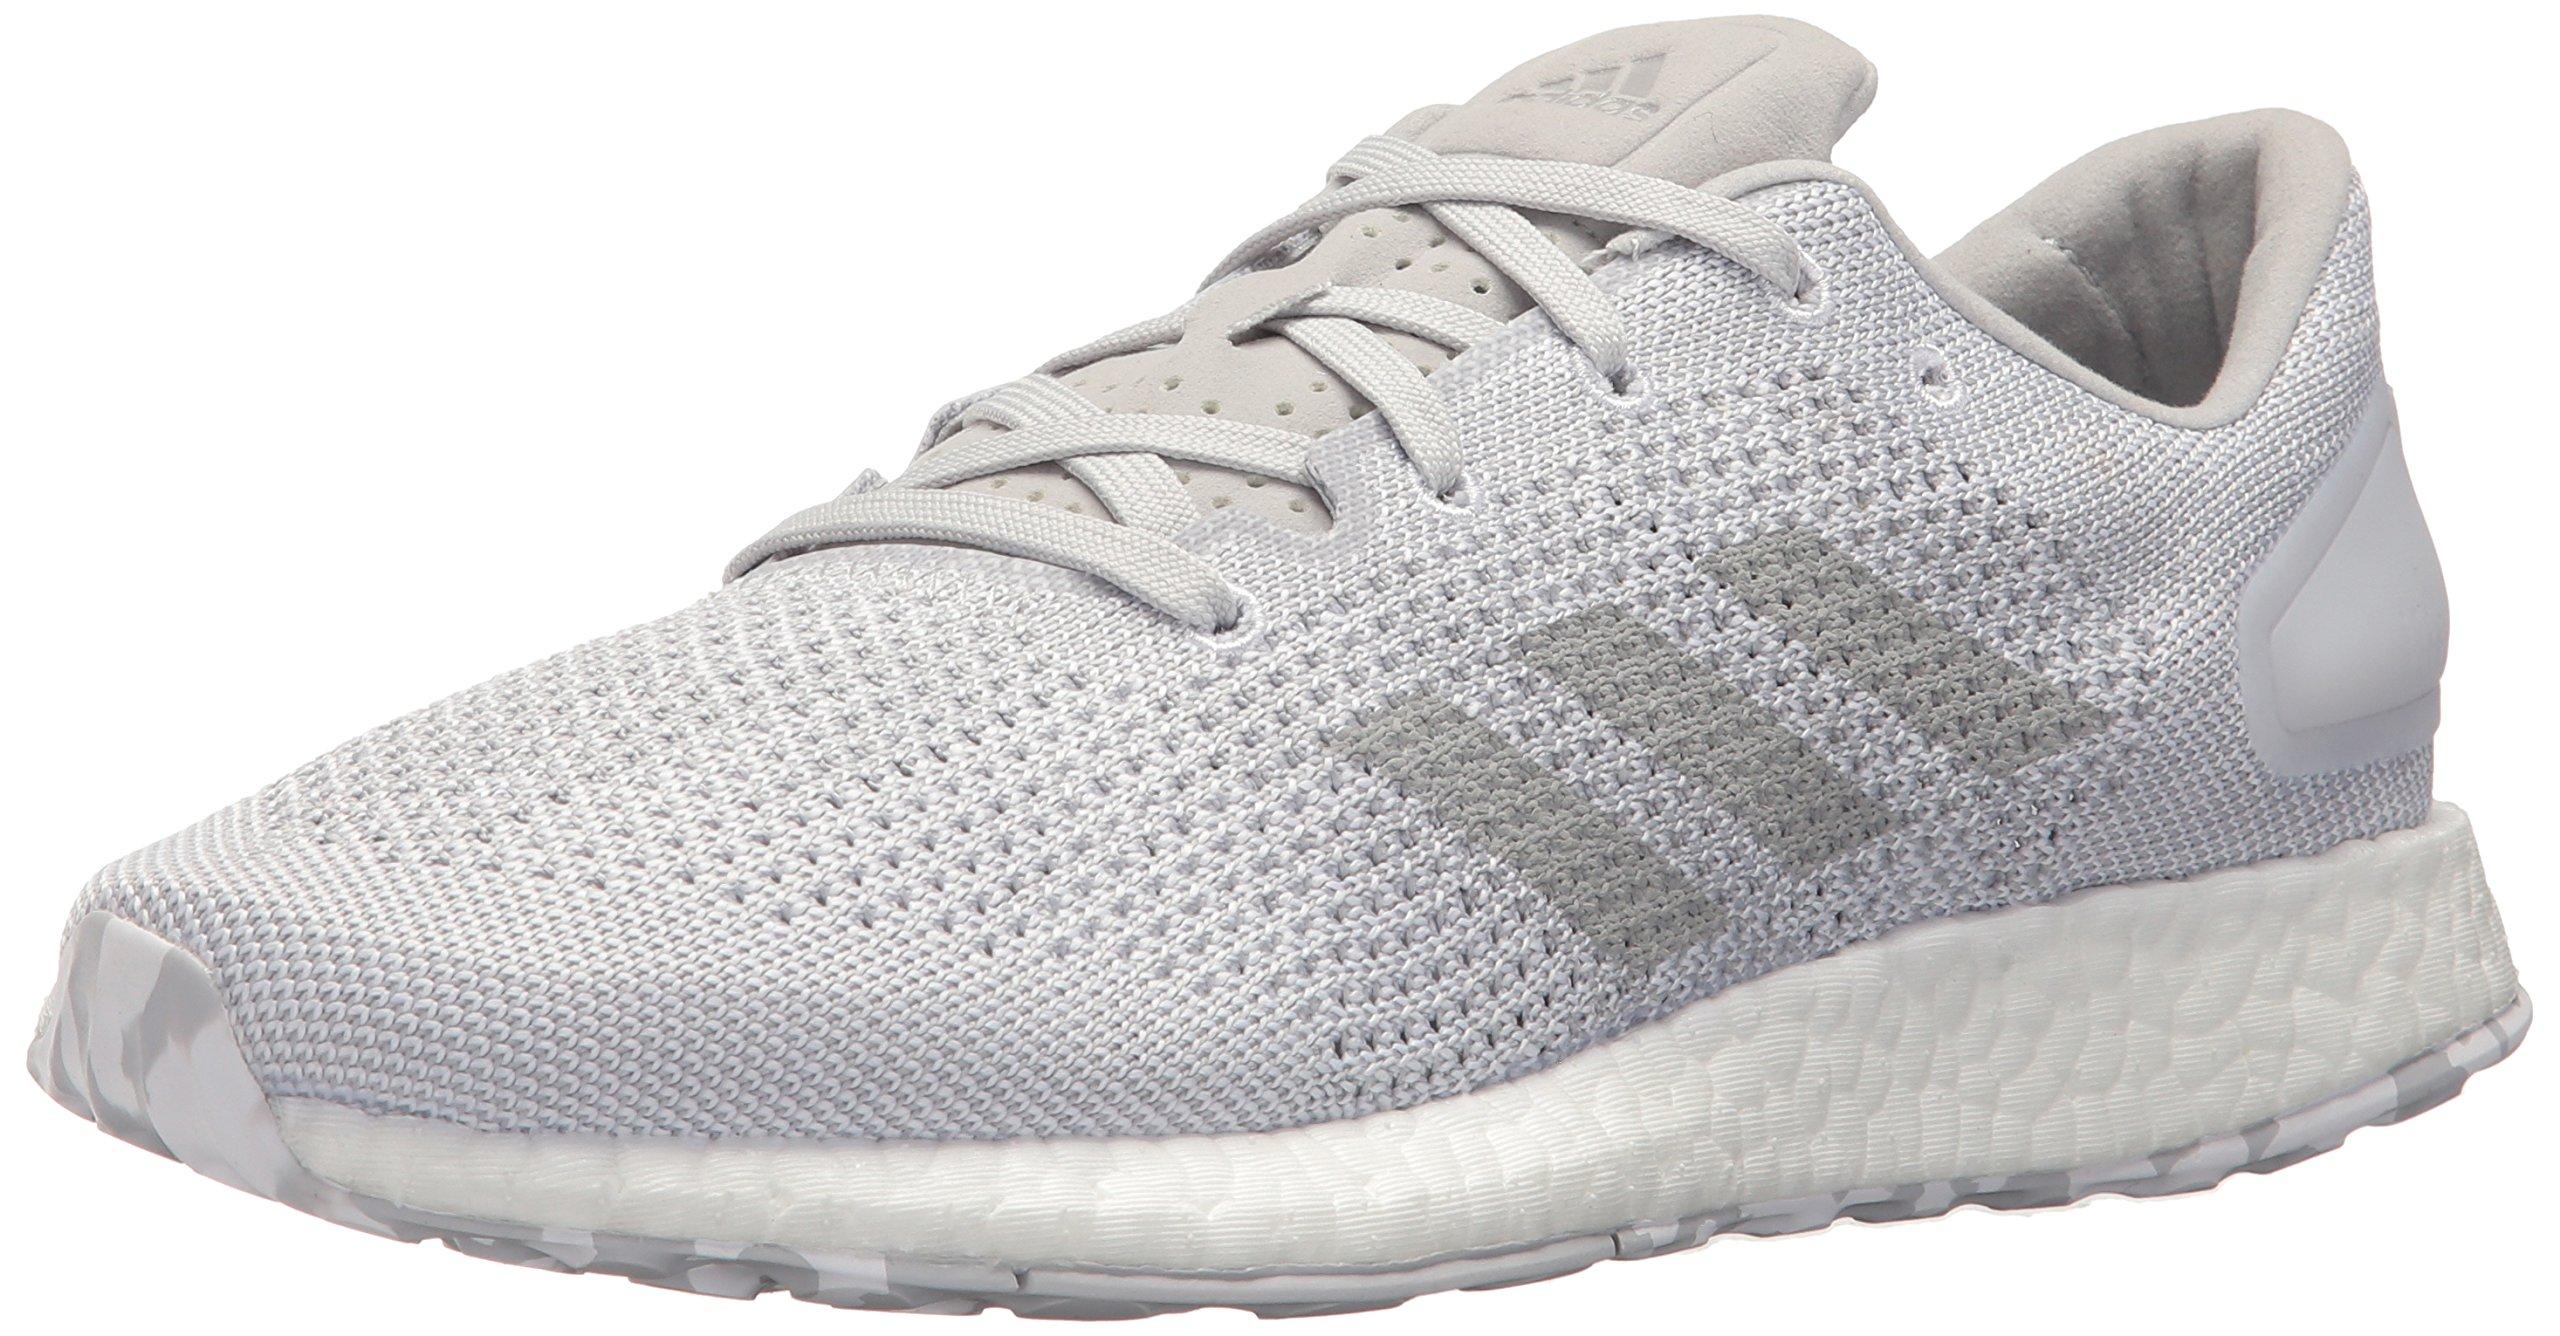 ad21c75ae0258f Galleon - Adidas Men s Pureboost DPR Running Shoe